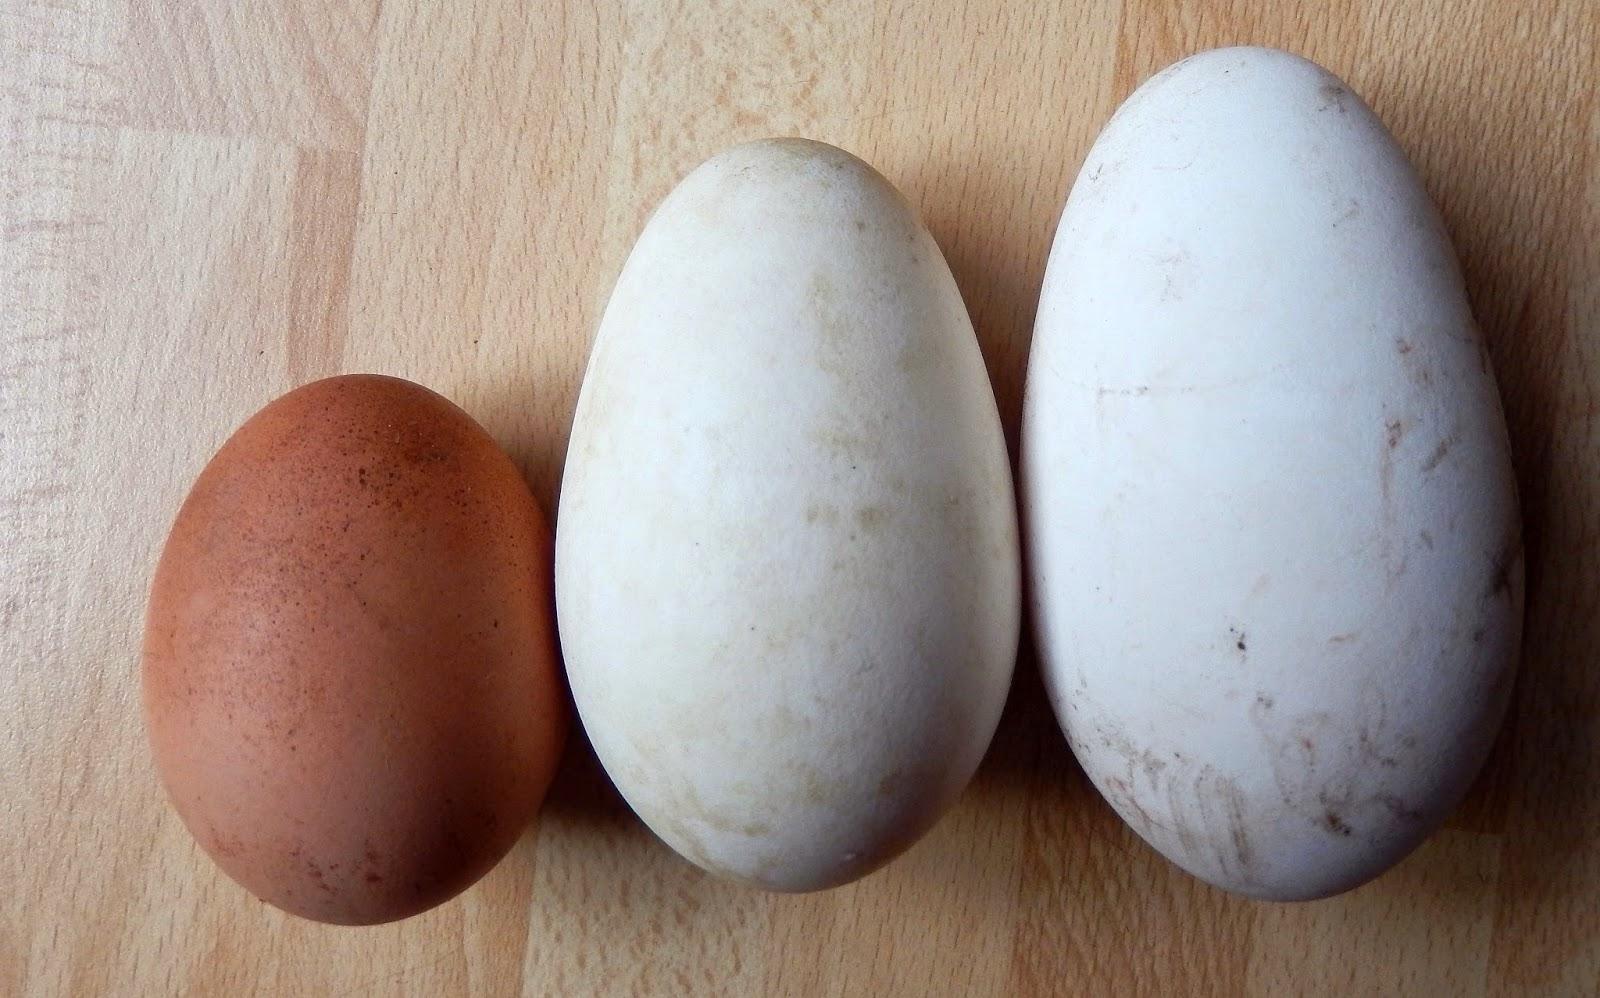 elke dag 2 eieren eten